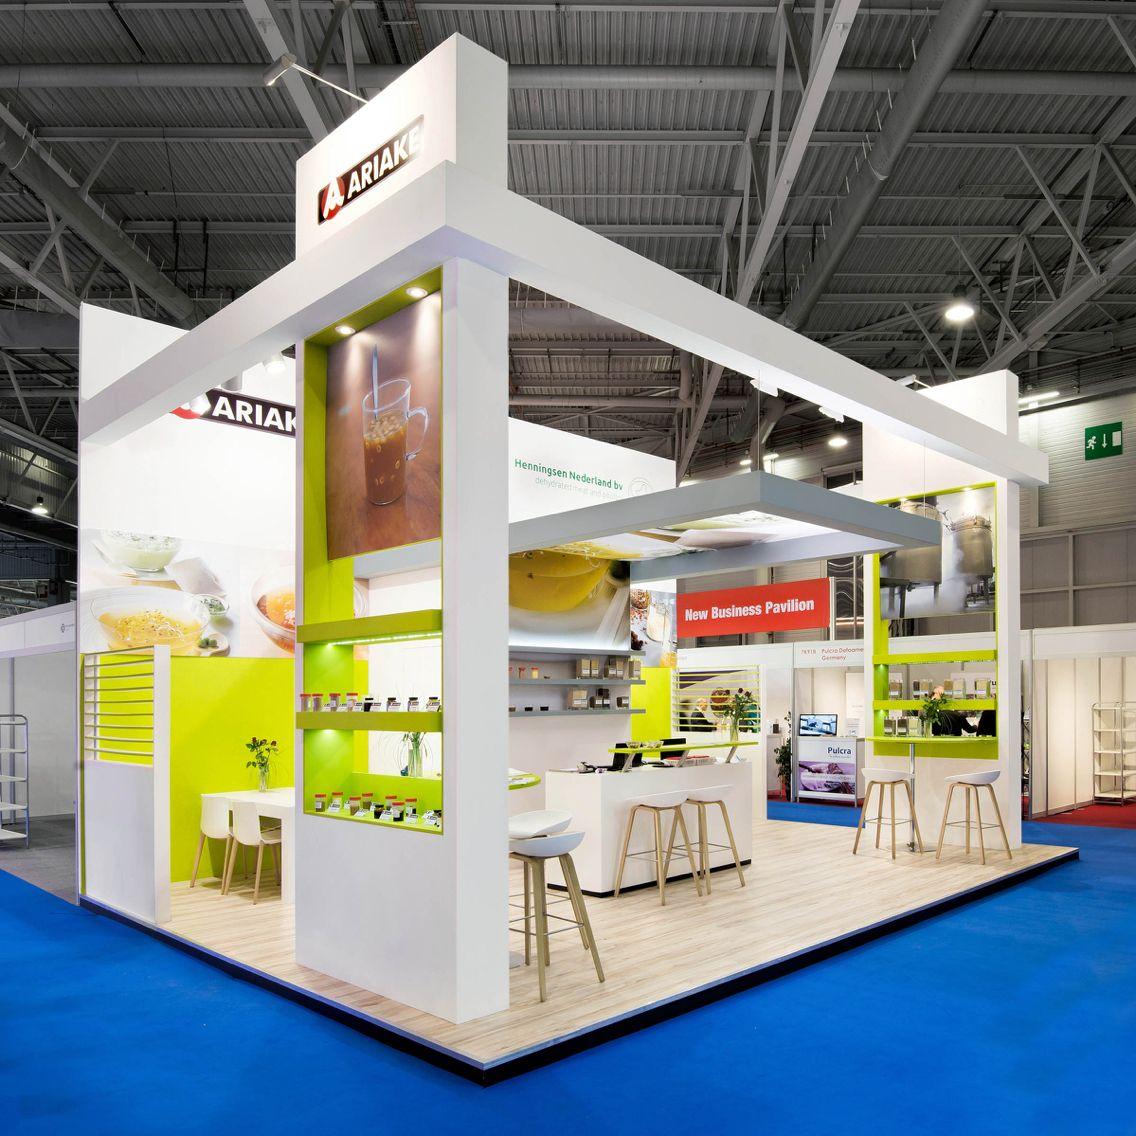 Trade Exhibition Stand Design : Henningsen fi europe custom exhibit trade show